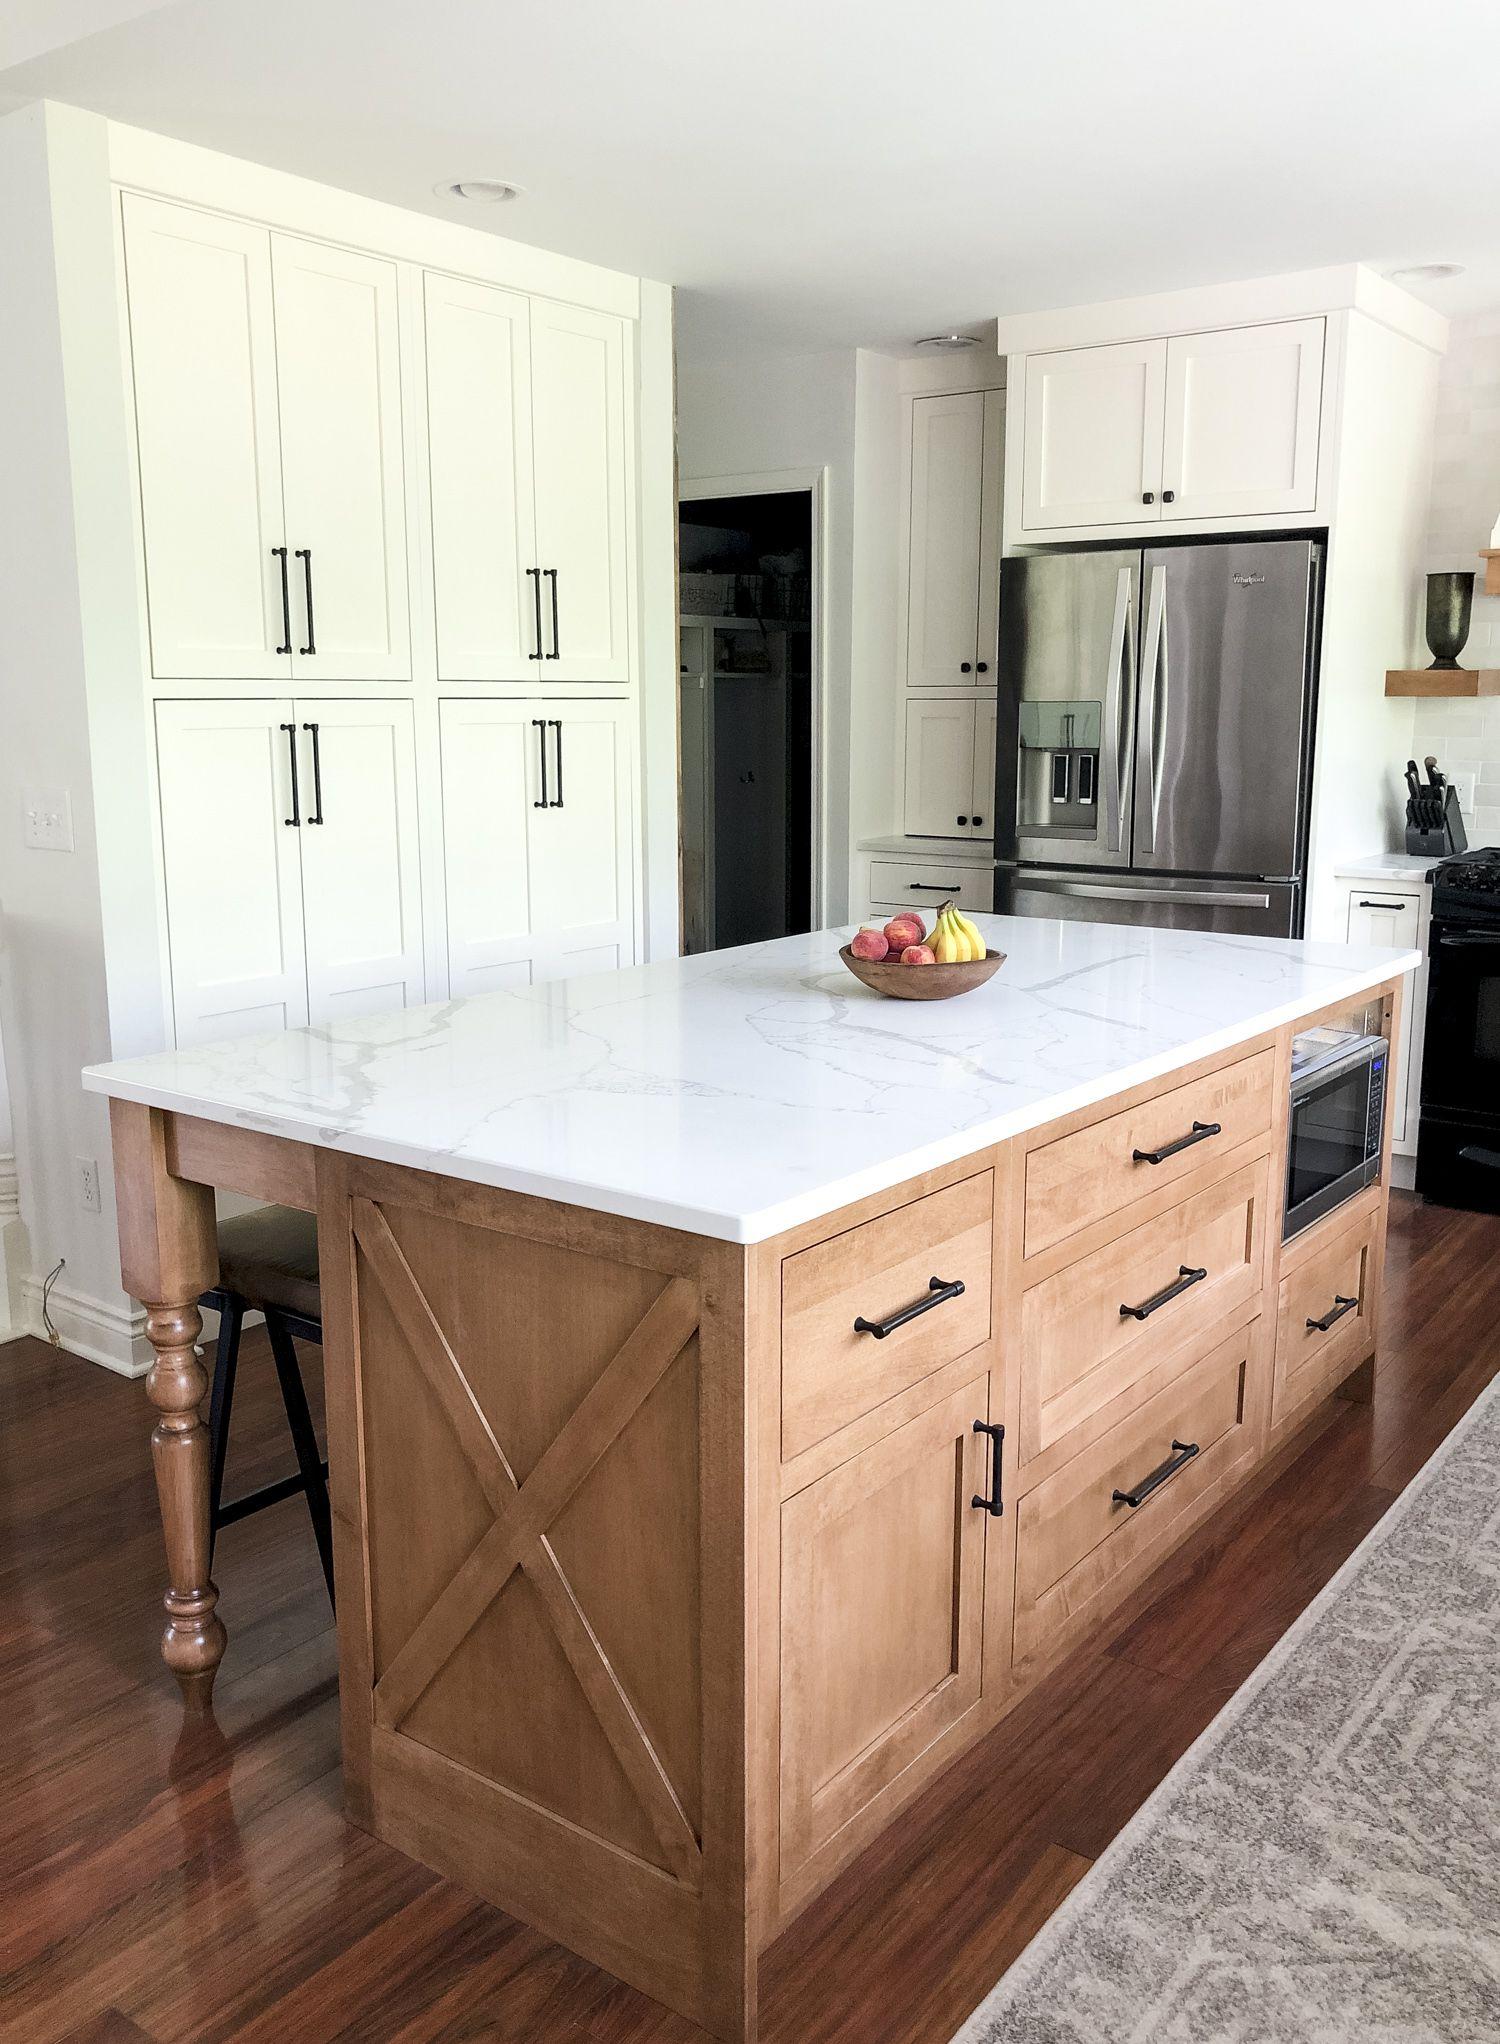 Affordable Quartz That Looks Like Marble Quartz Kitchen